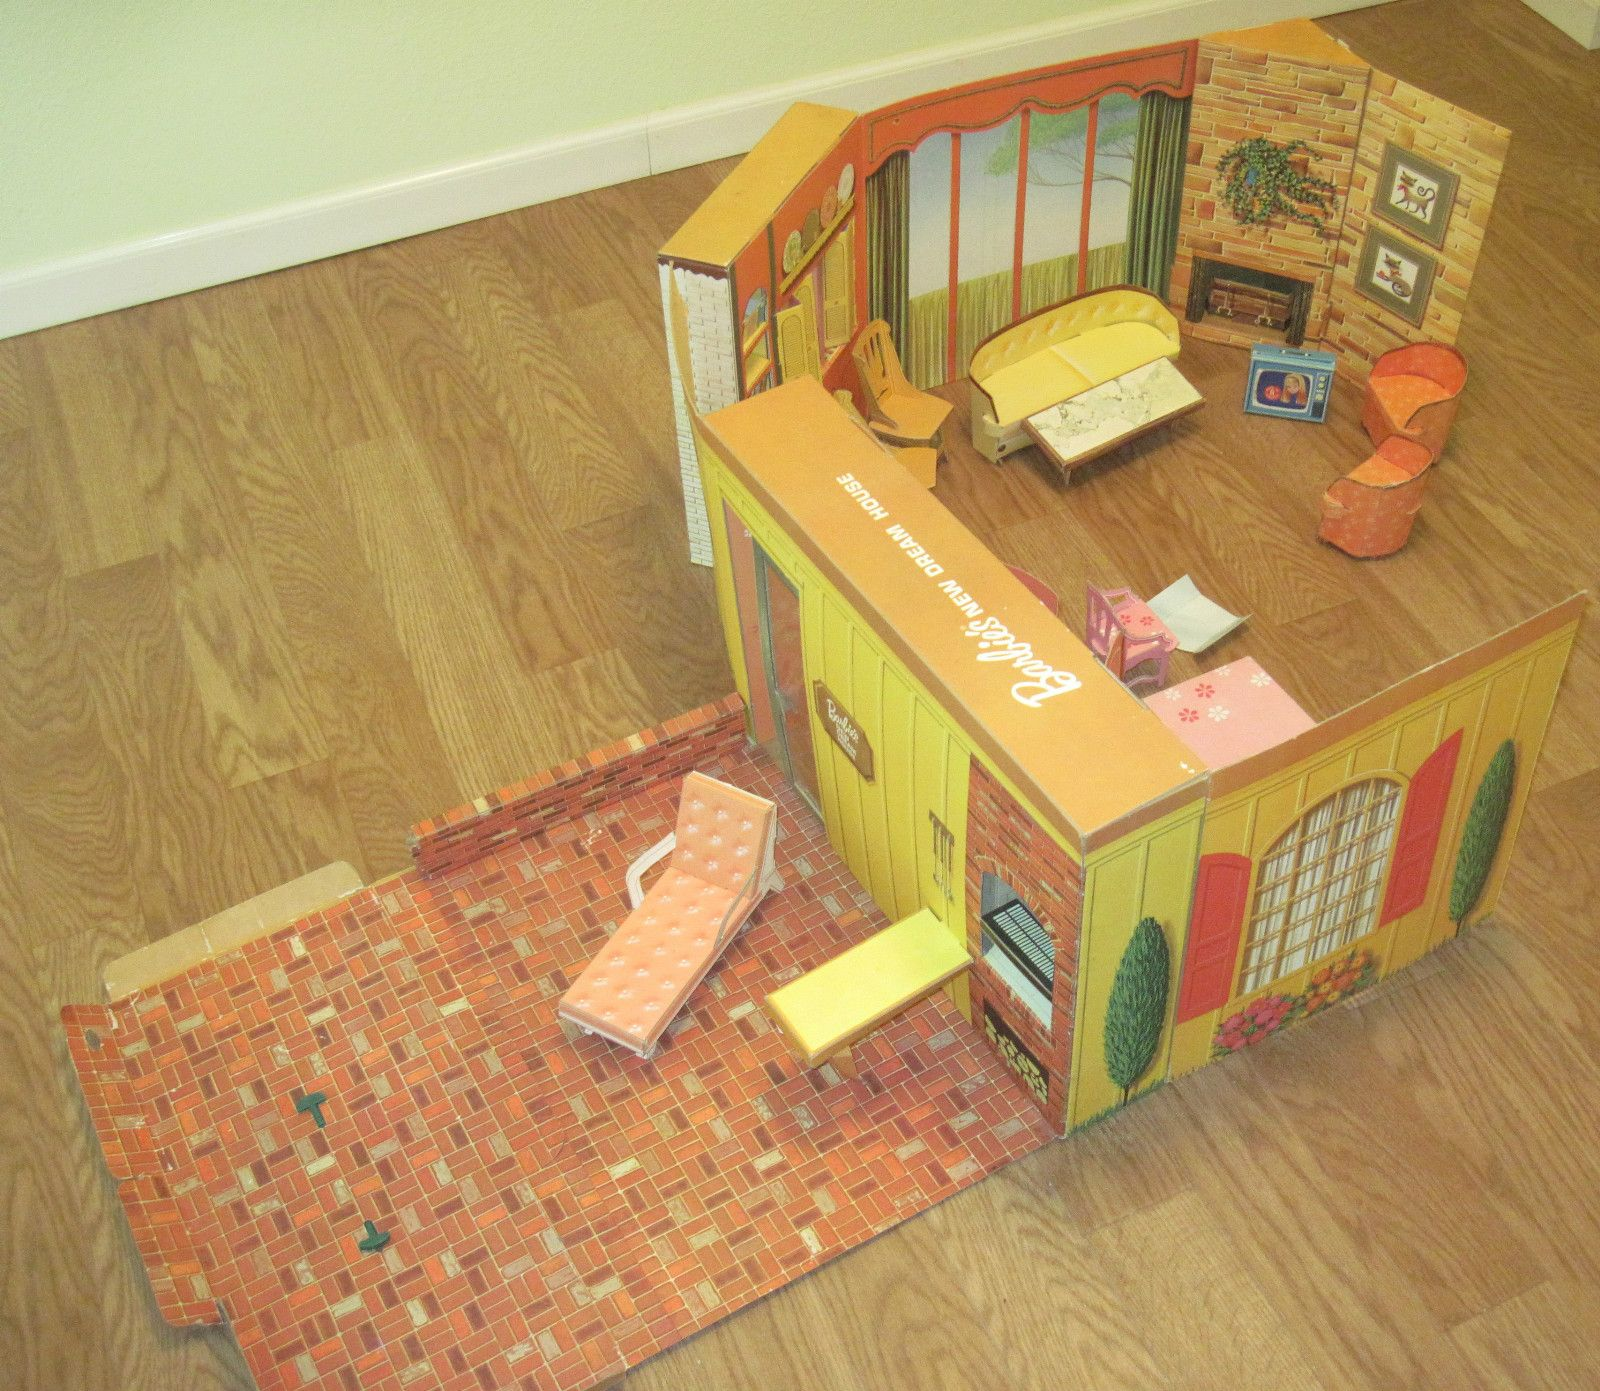 Barbie S Dream House 1964 Barbie Doll House Barbie House Barbie Dream House